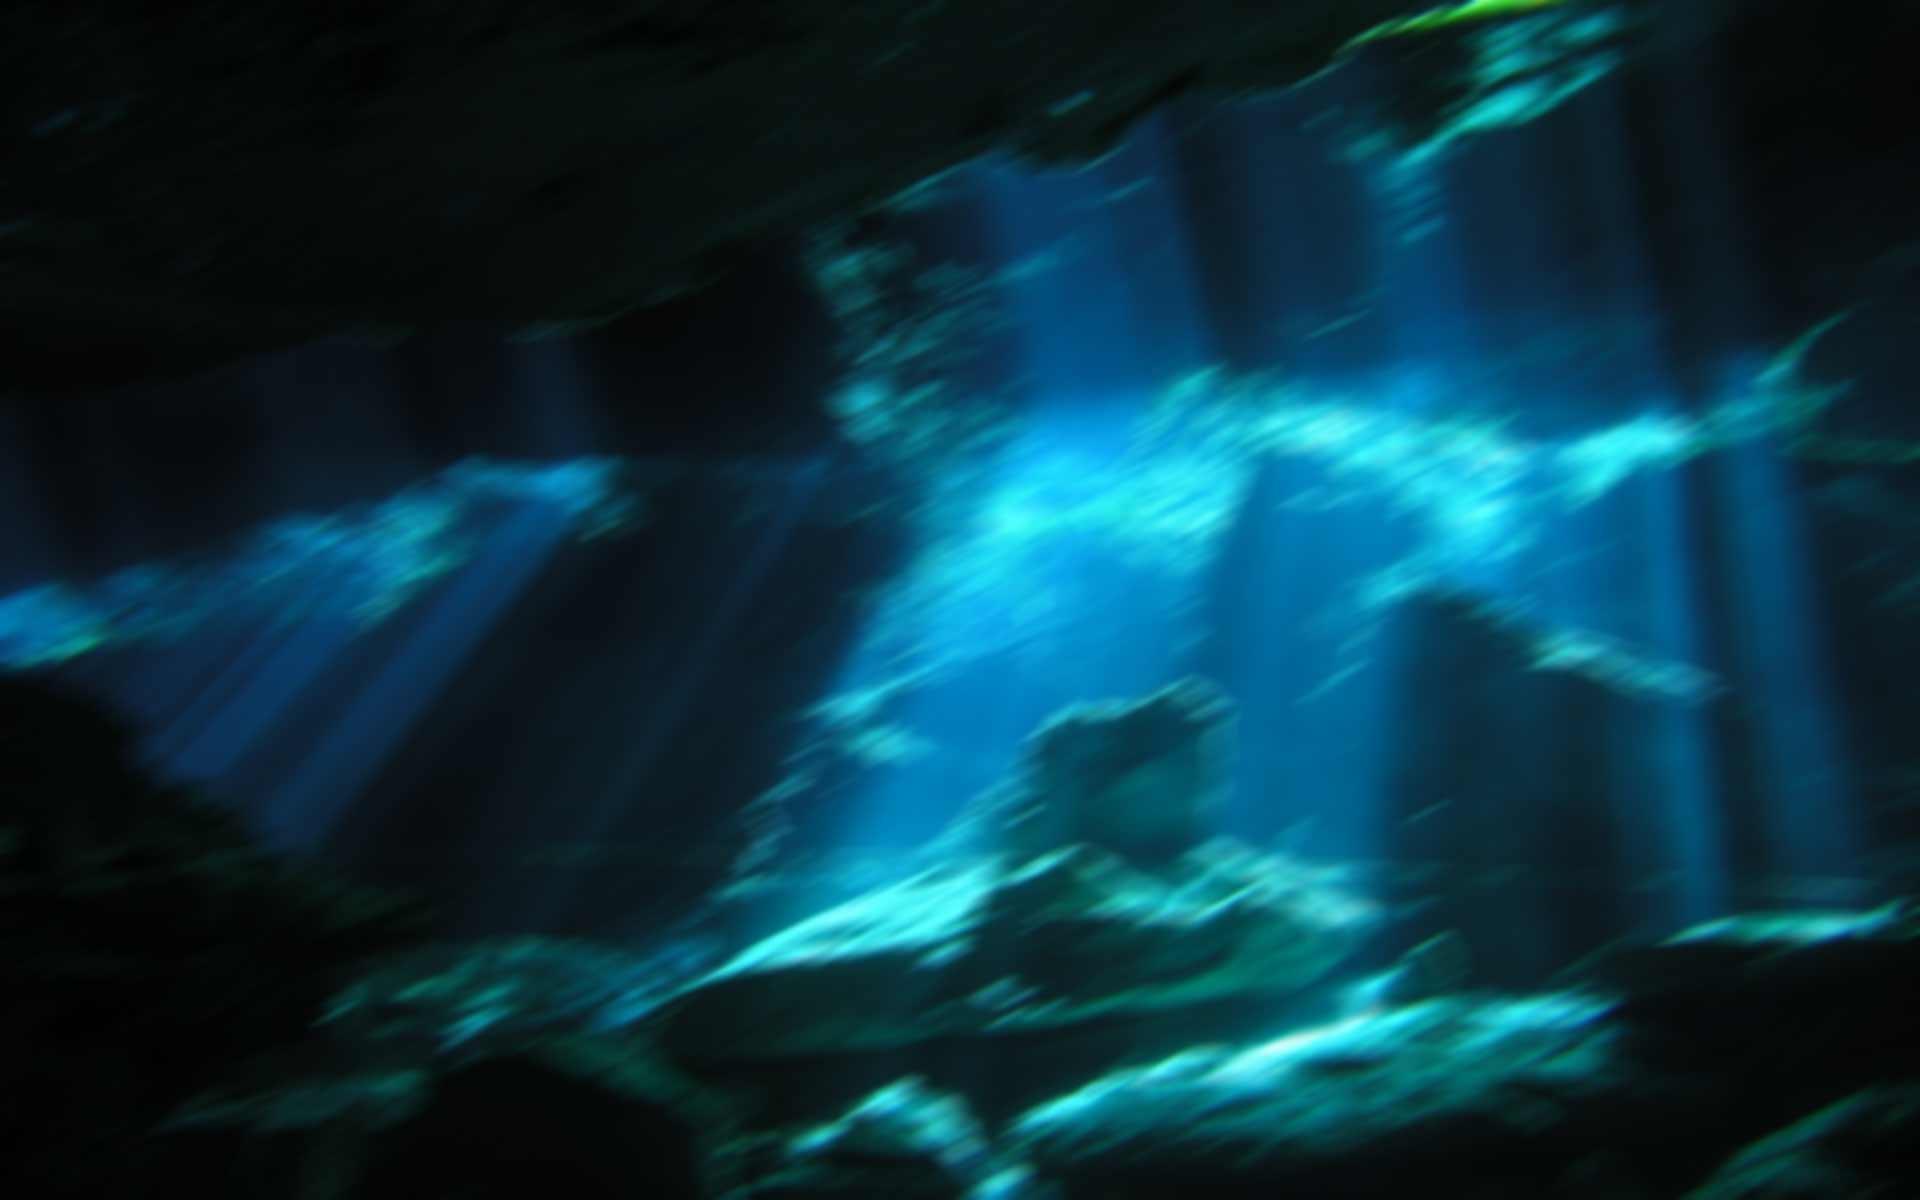 cenote_background